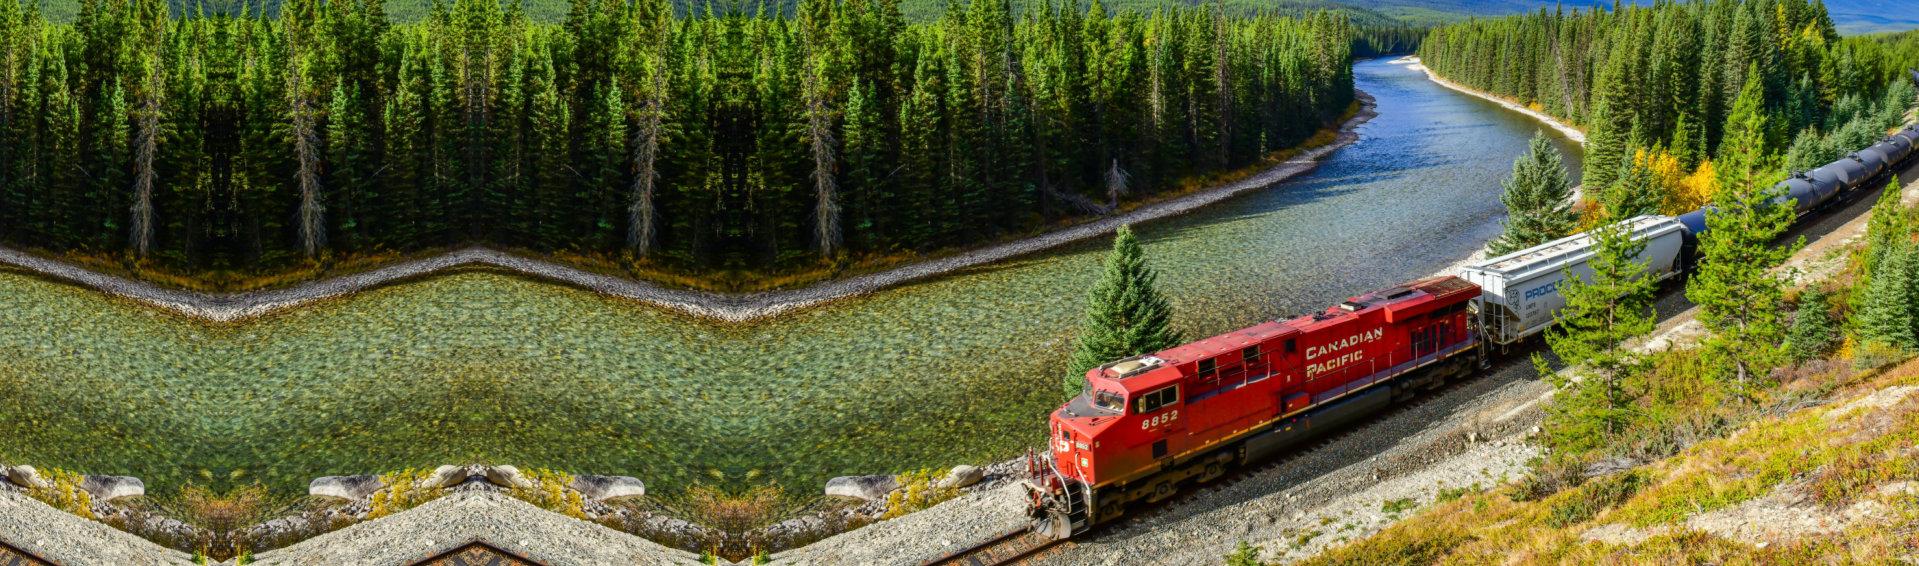 train accross the border